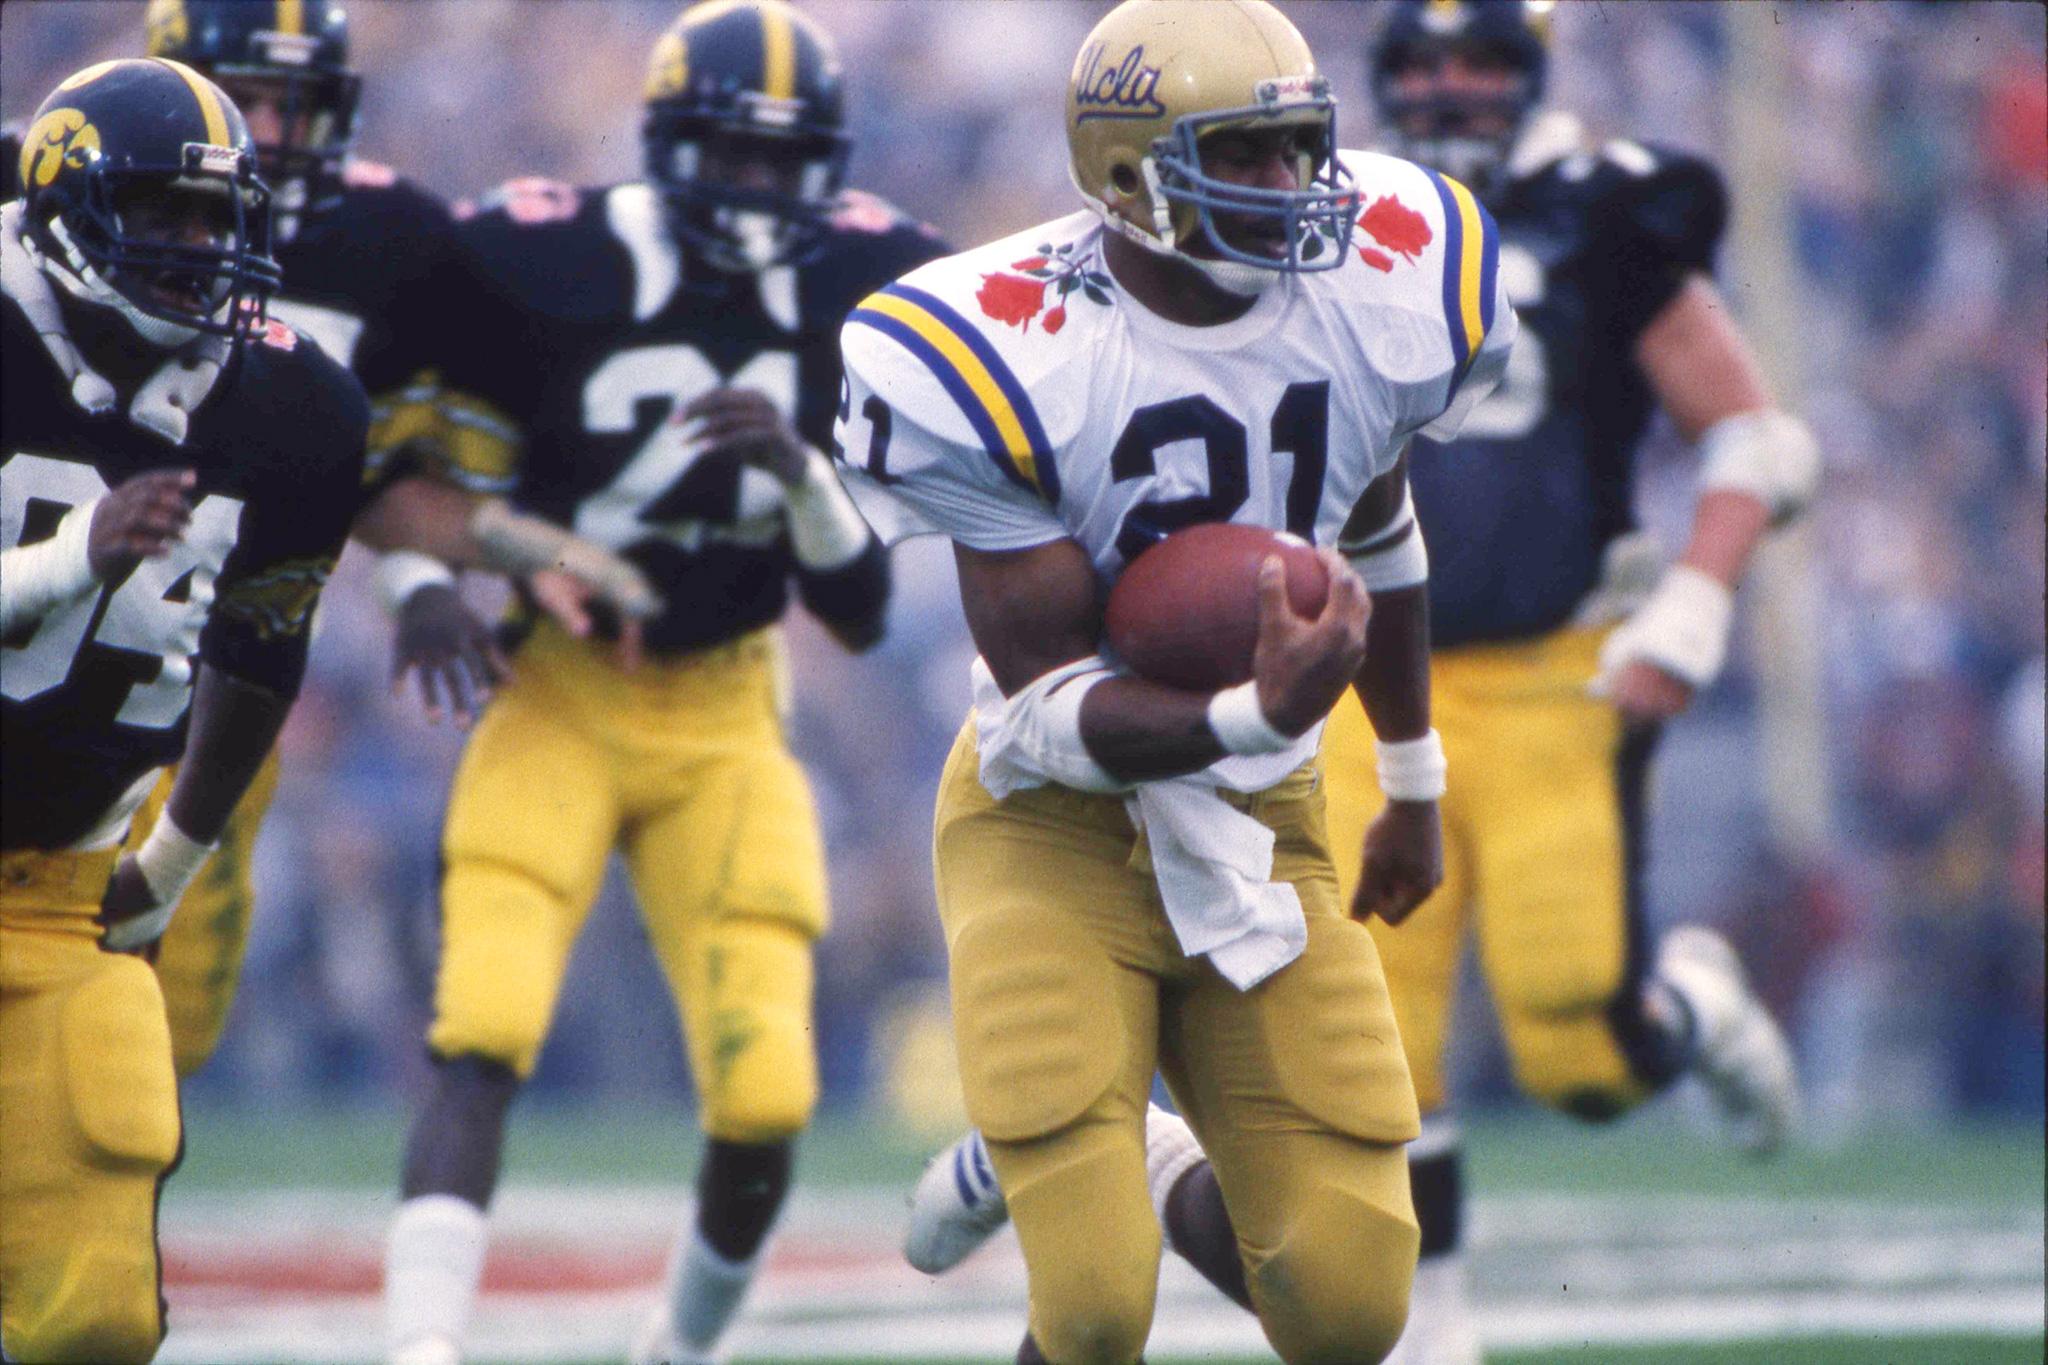 1986 Rose Bowl